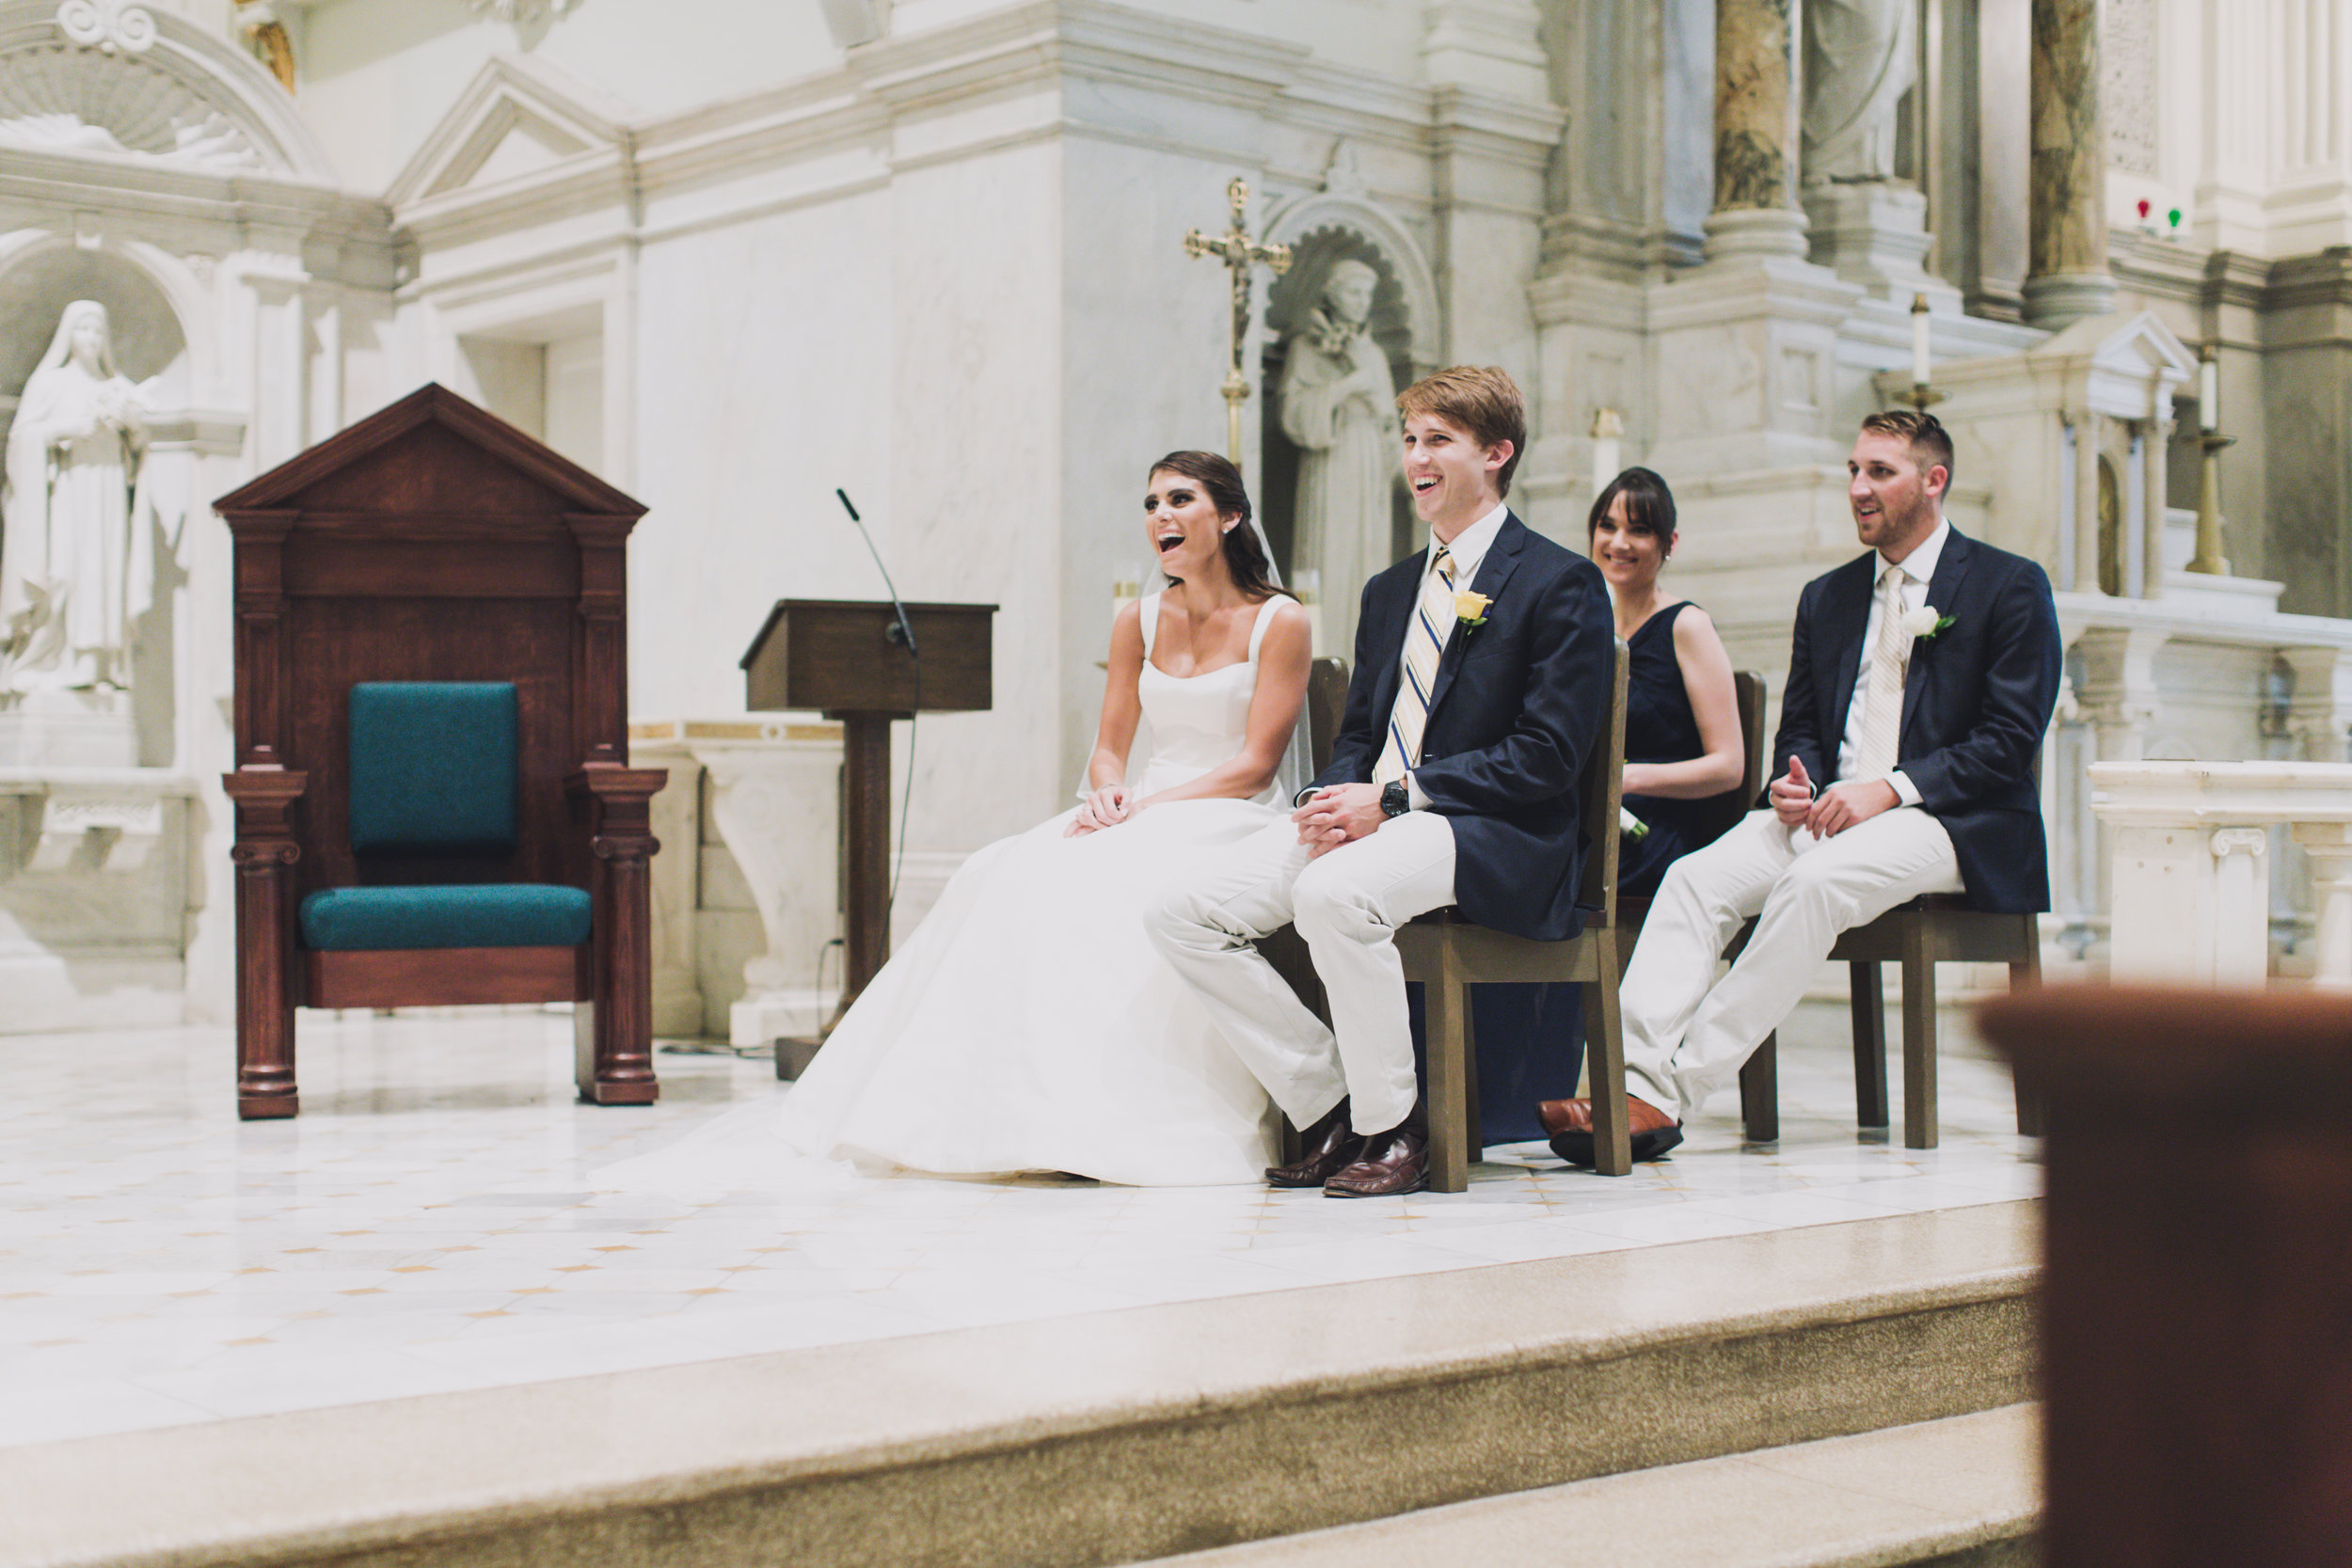 Madeleine_Matt_Wedding_Slideshow_Jpegs-060.jpg